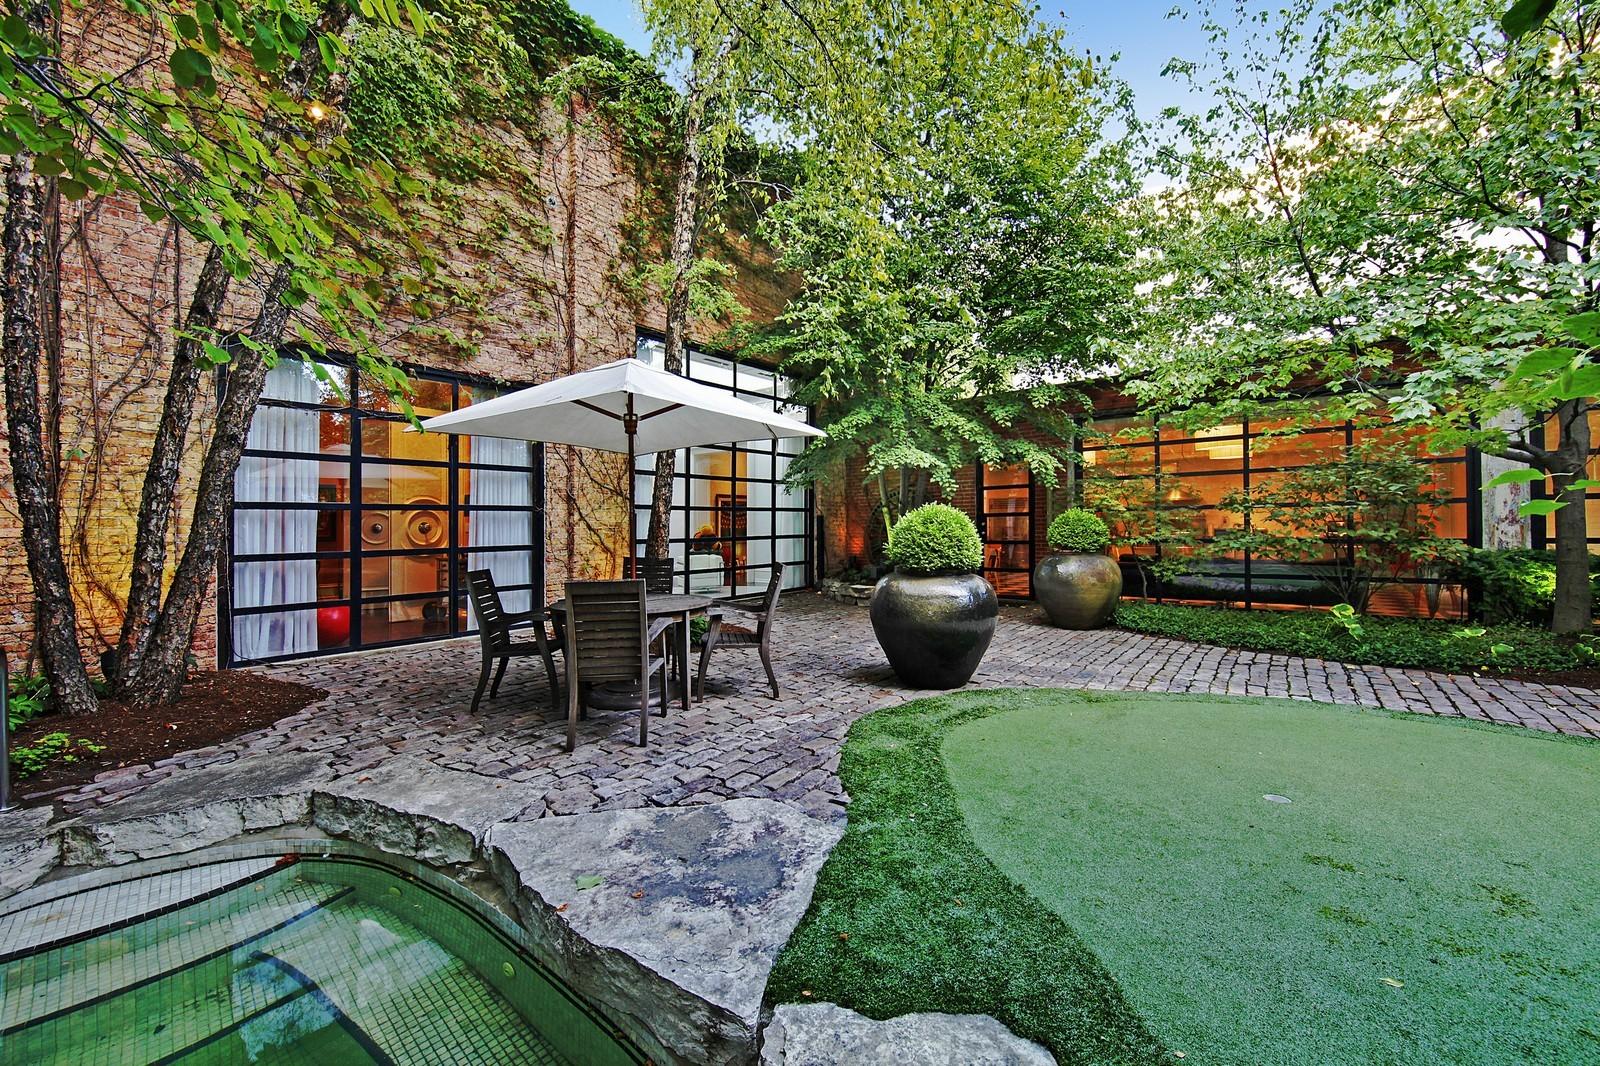 Real Estate Photography - 1424 W Ohio St, Chicago, IL, 60622 - Patio